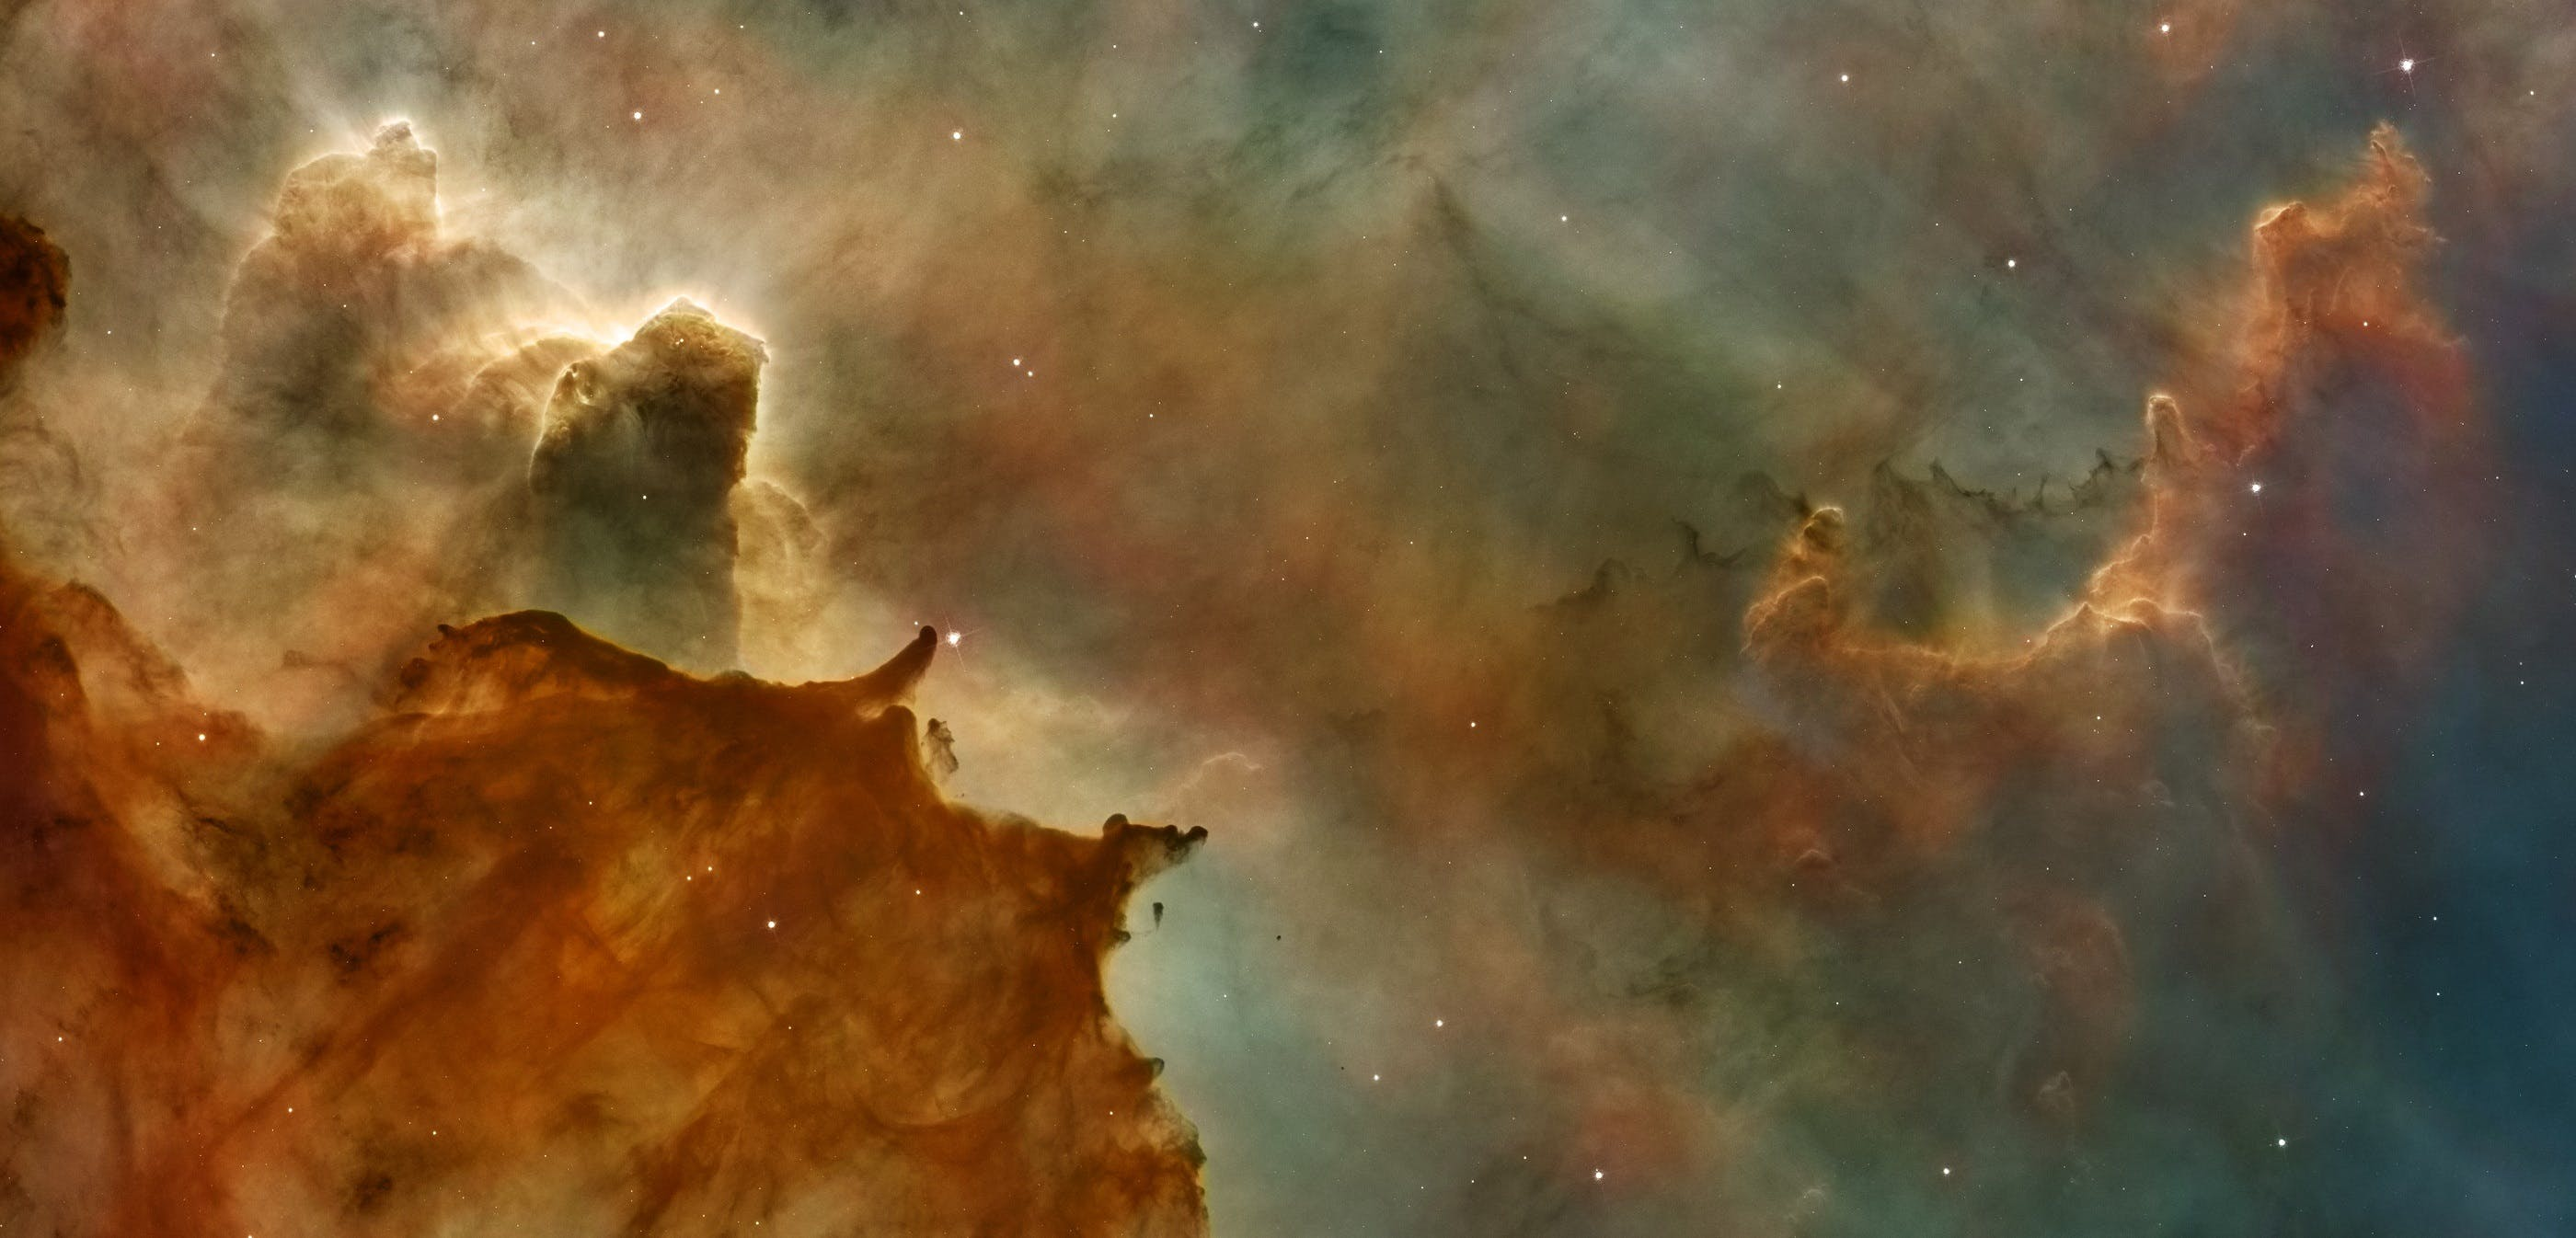 Free stock photo of space, dust, telescope, stars